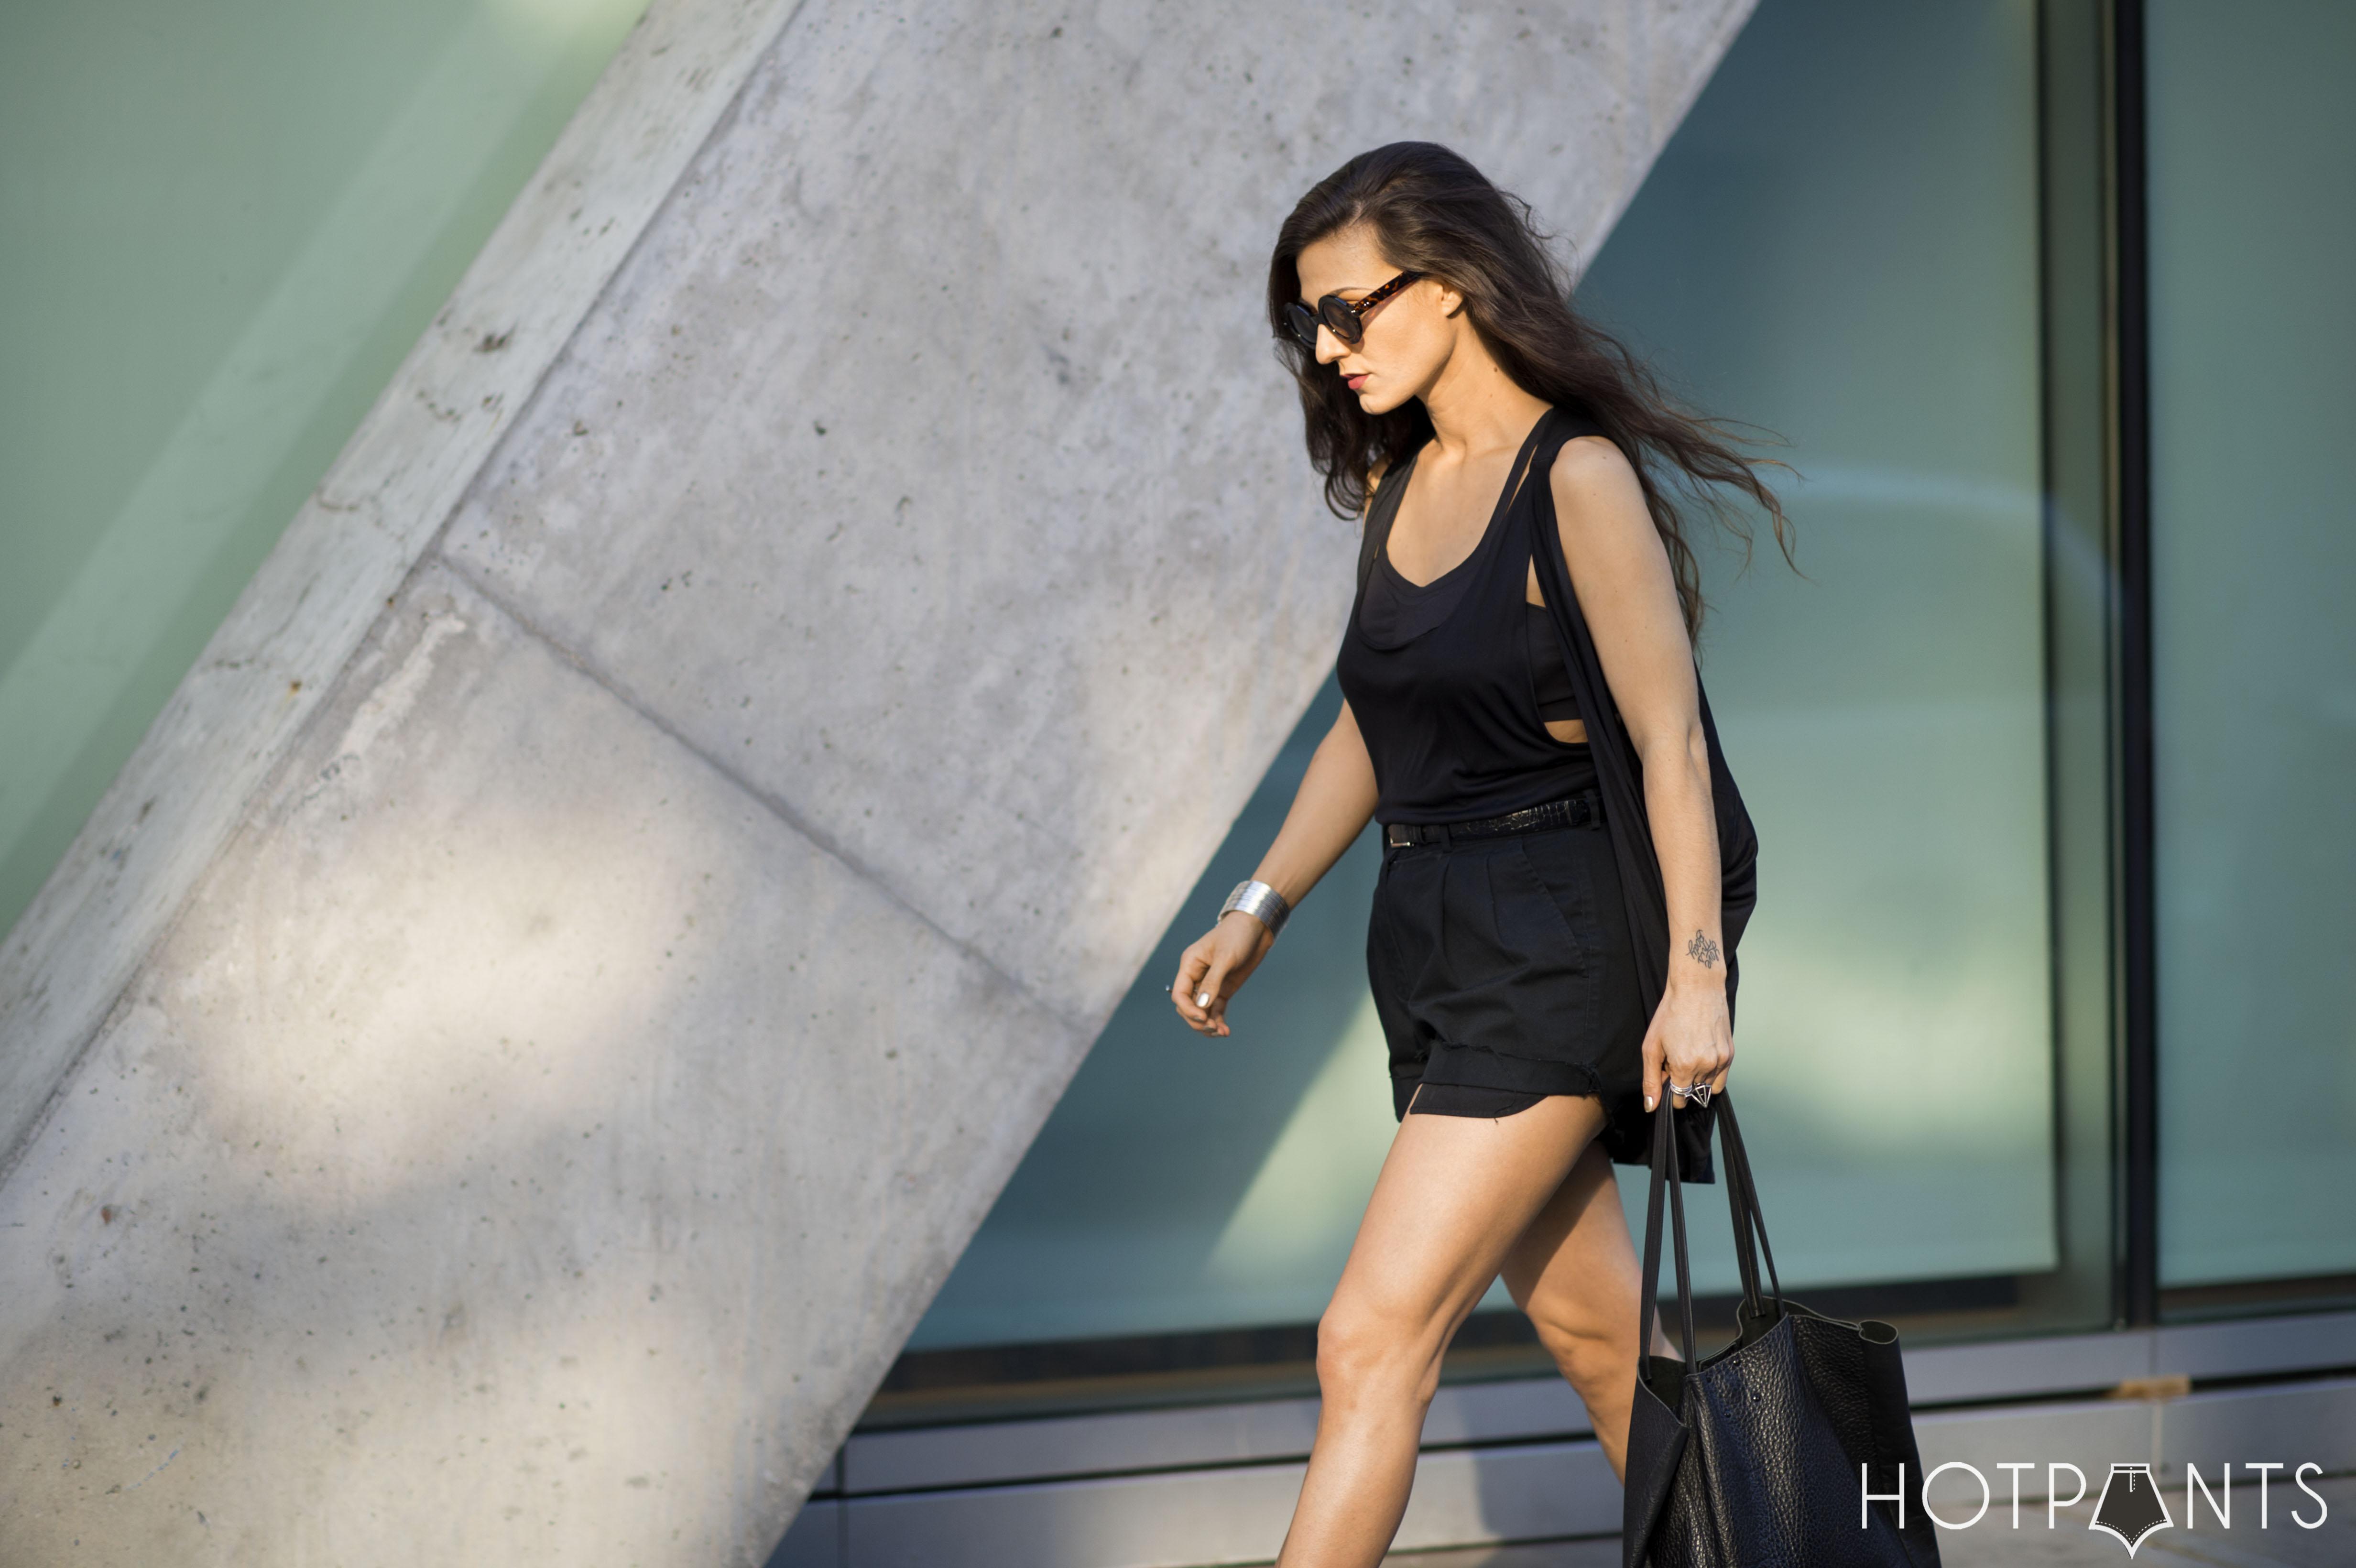 Long Brown Hair Ankle Boots Curvy Woman Legs Fashion